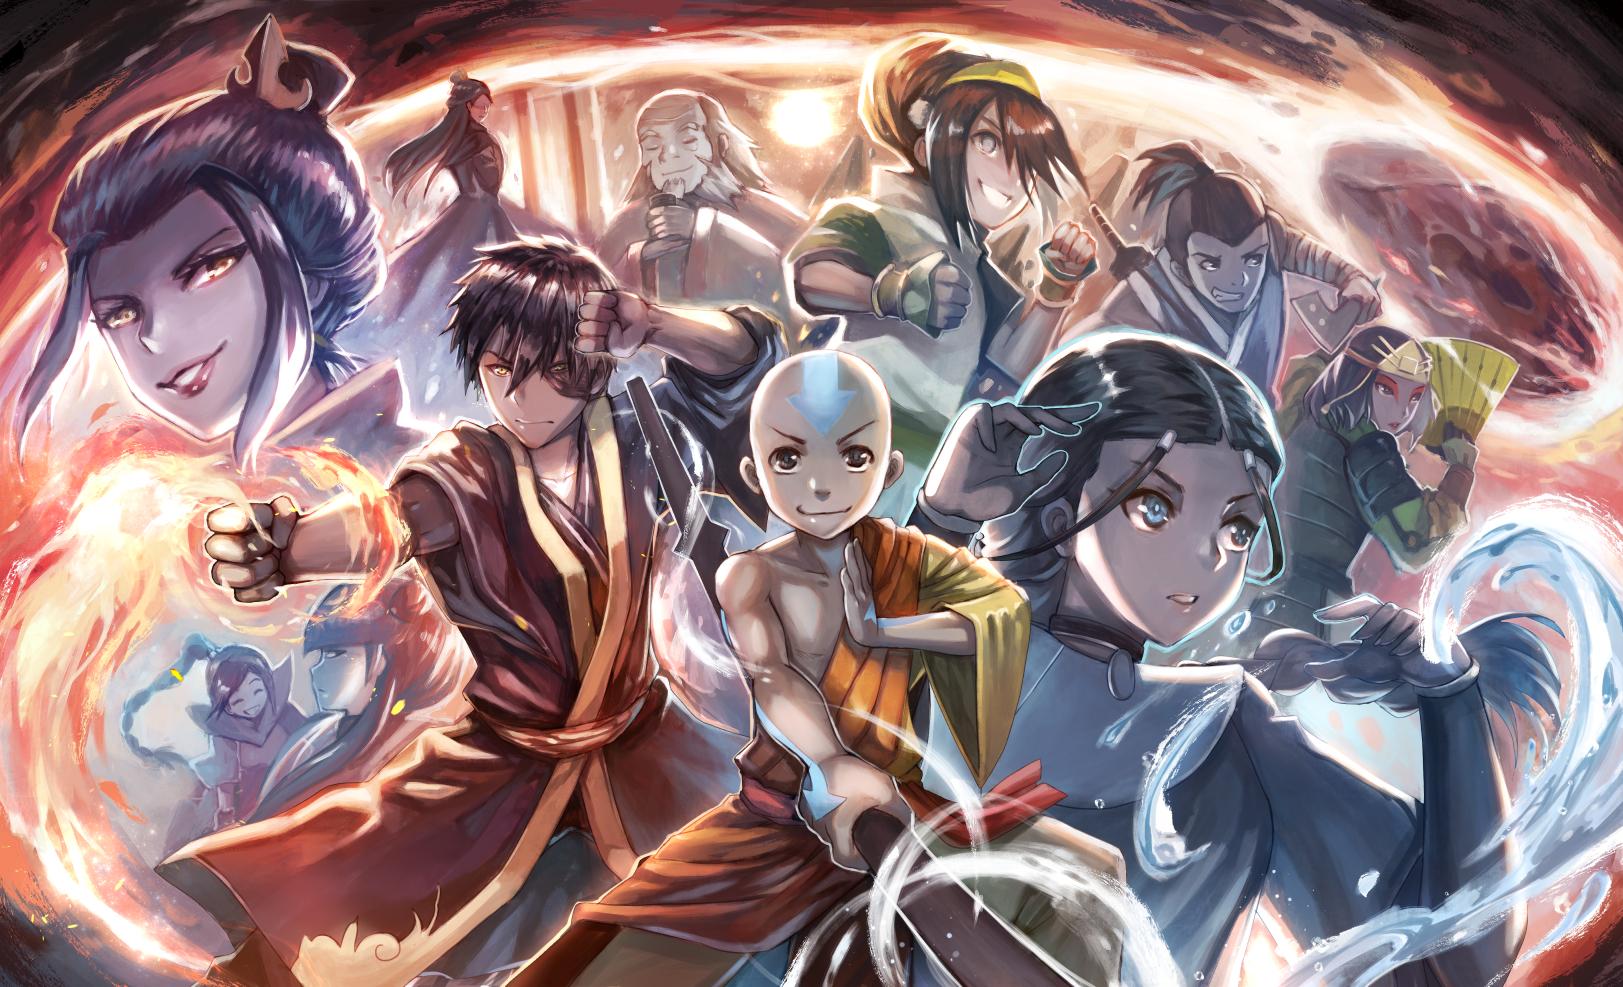 Avatar Azula Mai Ty Lee avatar: the last airbender image #2434376 - zerochan anime